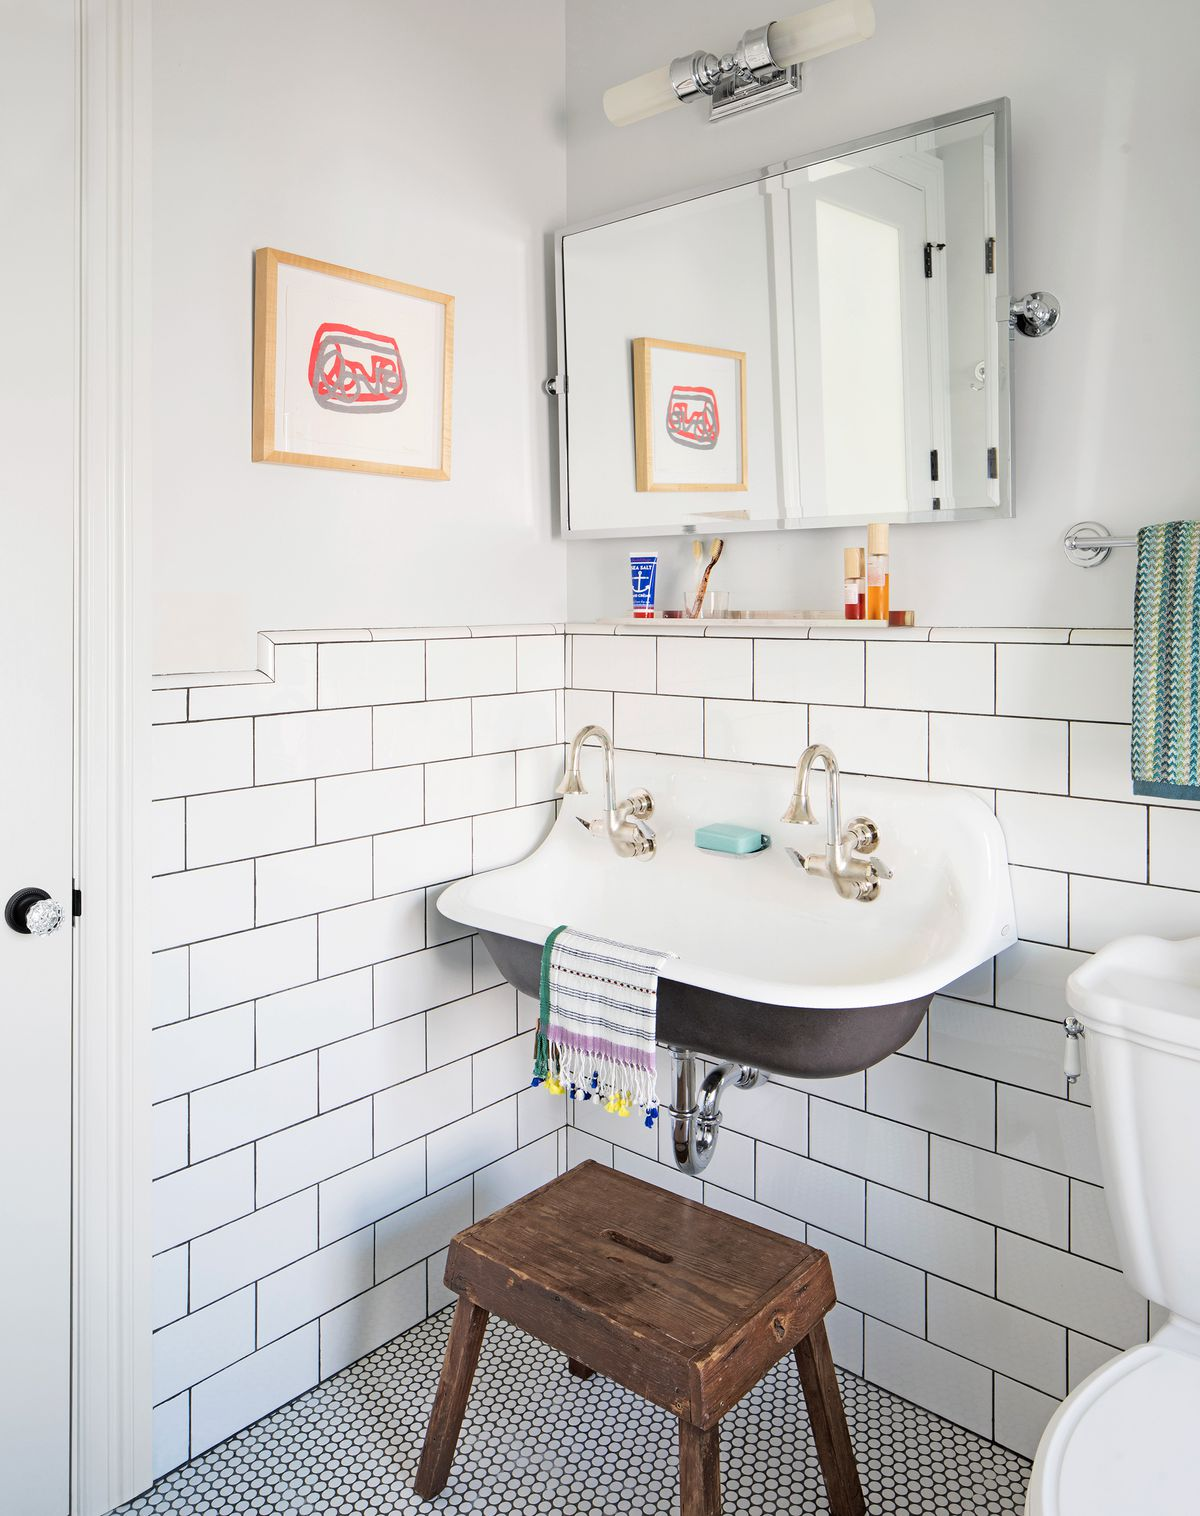 Reed House, childrens' bath sink